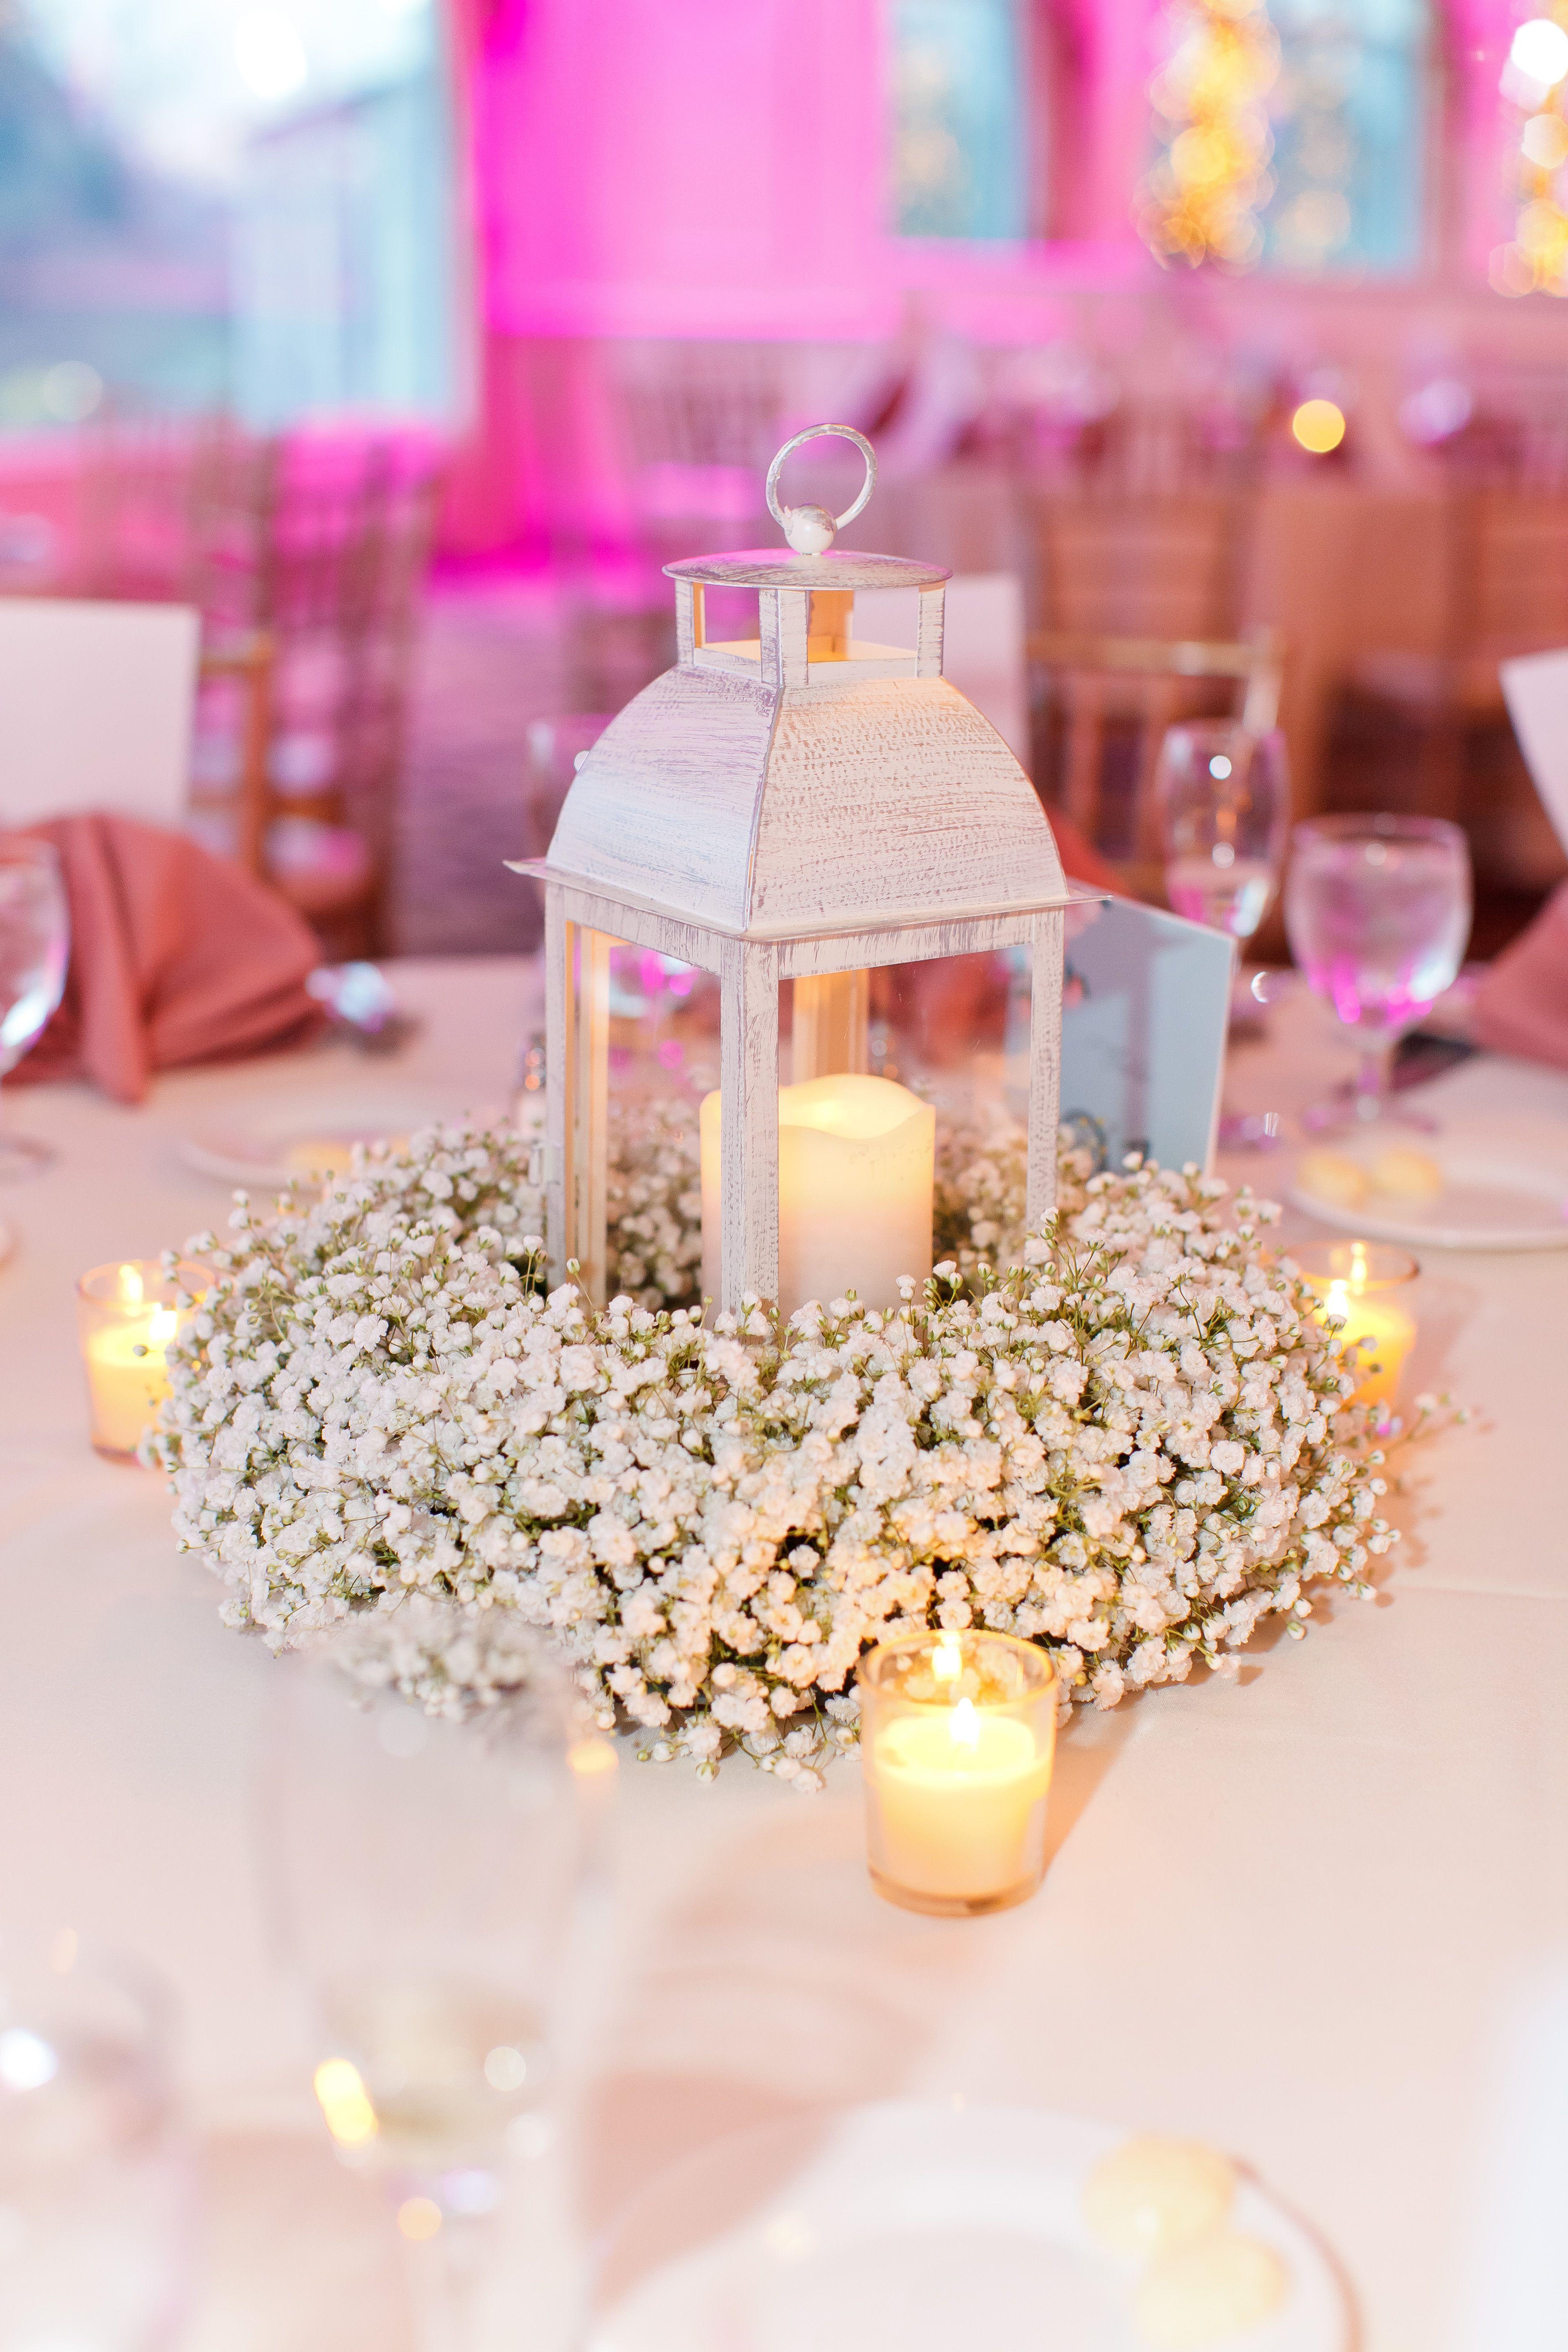 Diy flower decorations wedding  Babyus Breath Wreath Centerpiece with Lantern and Candles  wedding